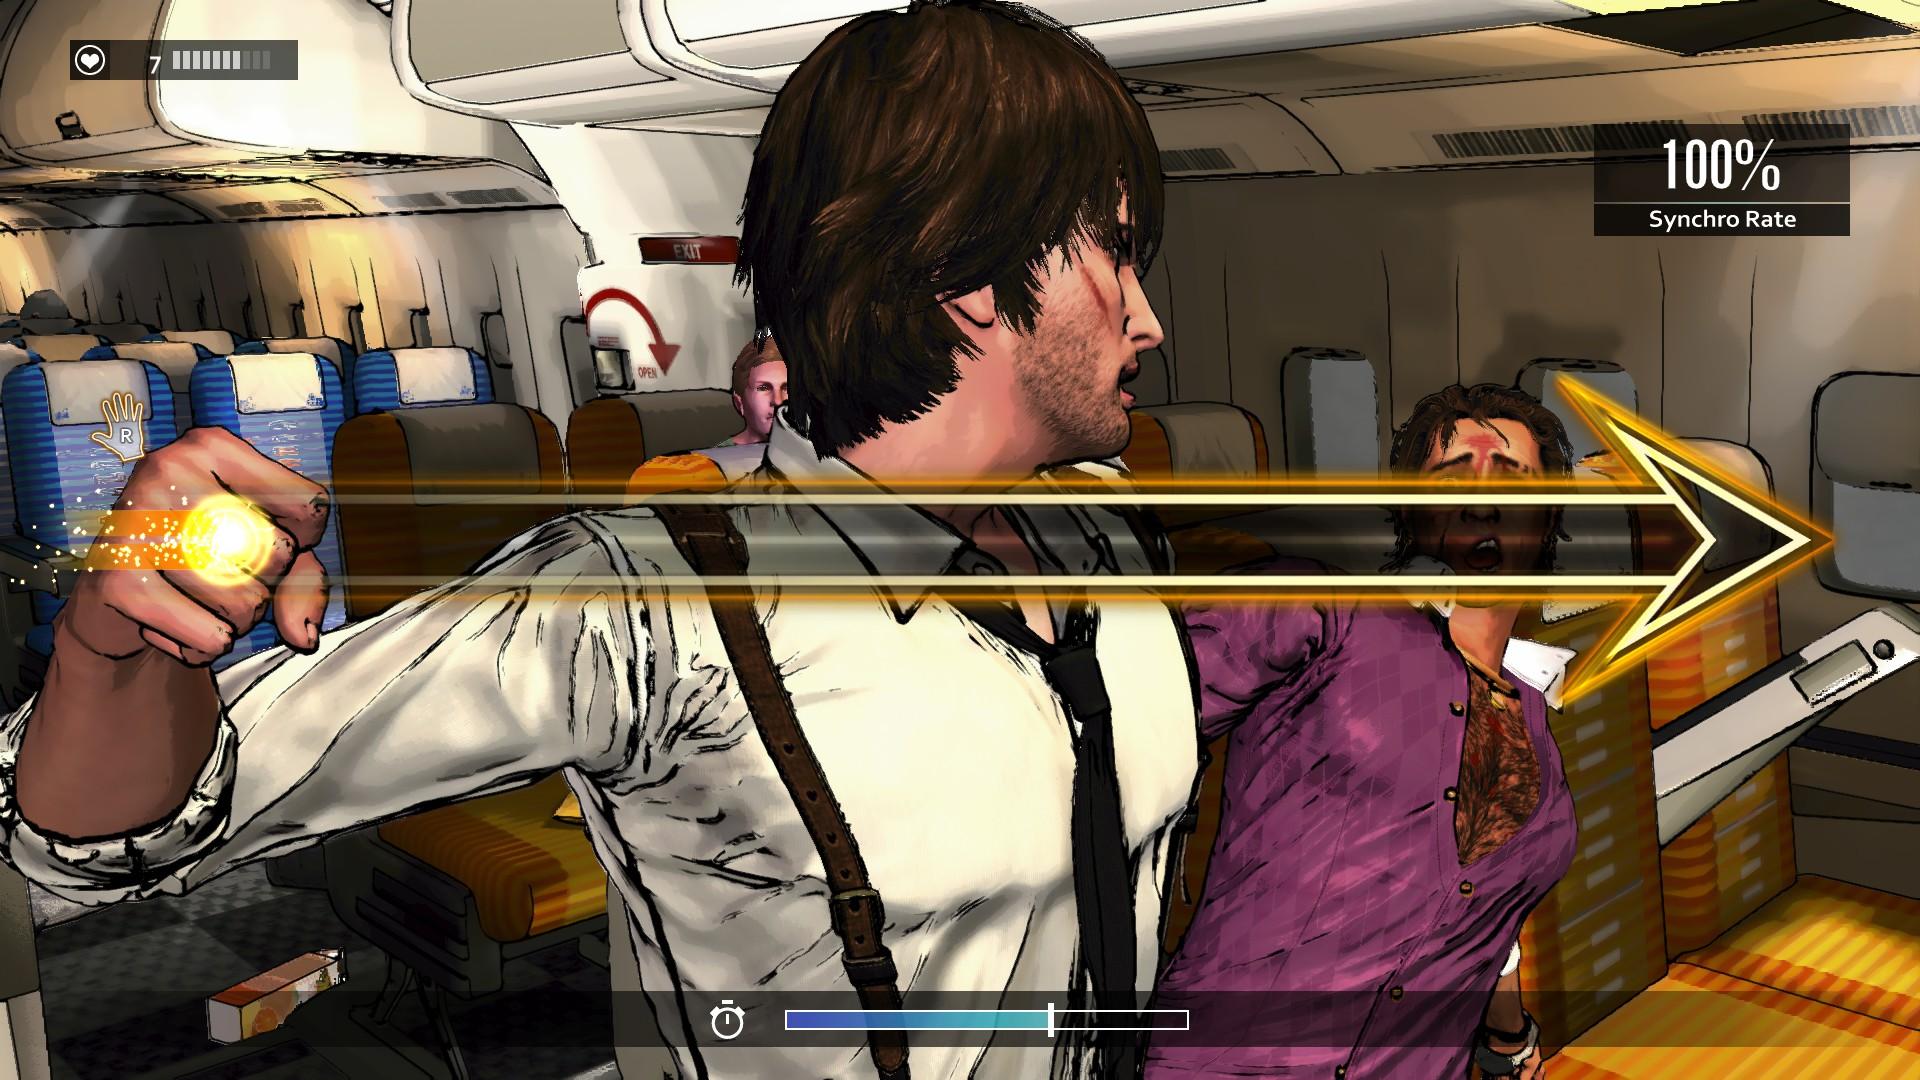 D4: Dark Dreams Don't Die - at least no Kinect makes sense